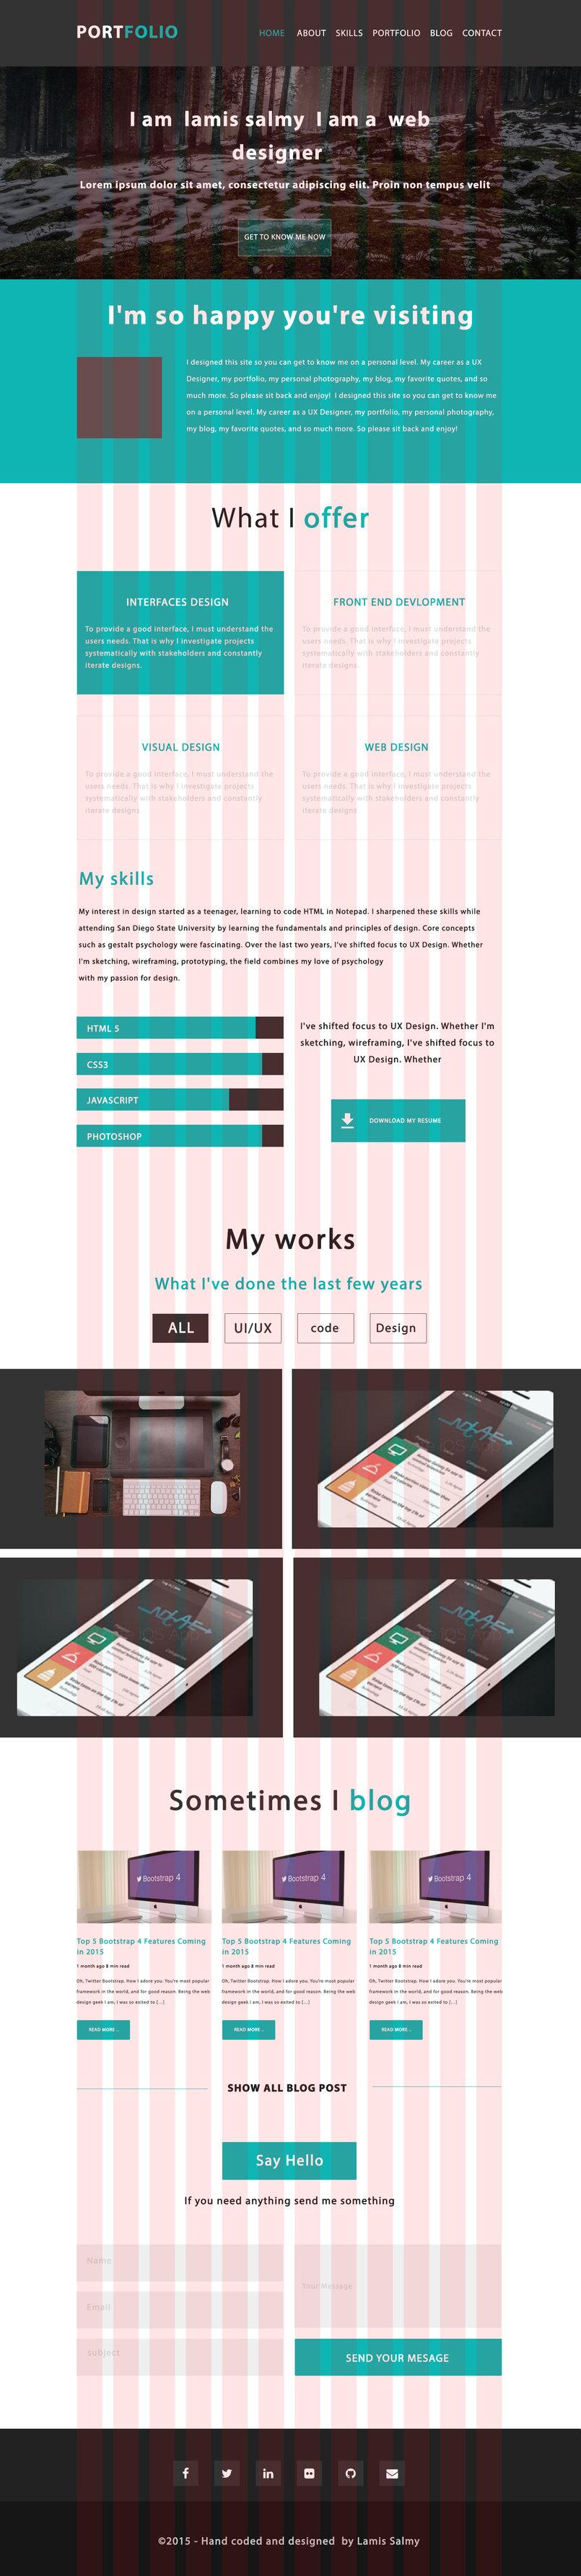 portfolio landing page-with grid sysytem